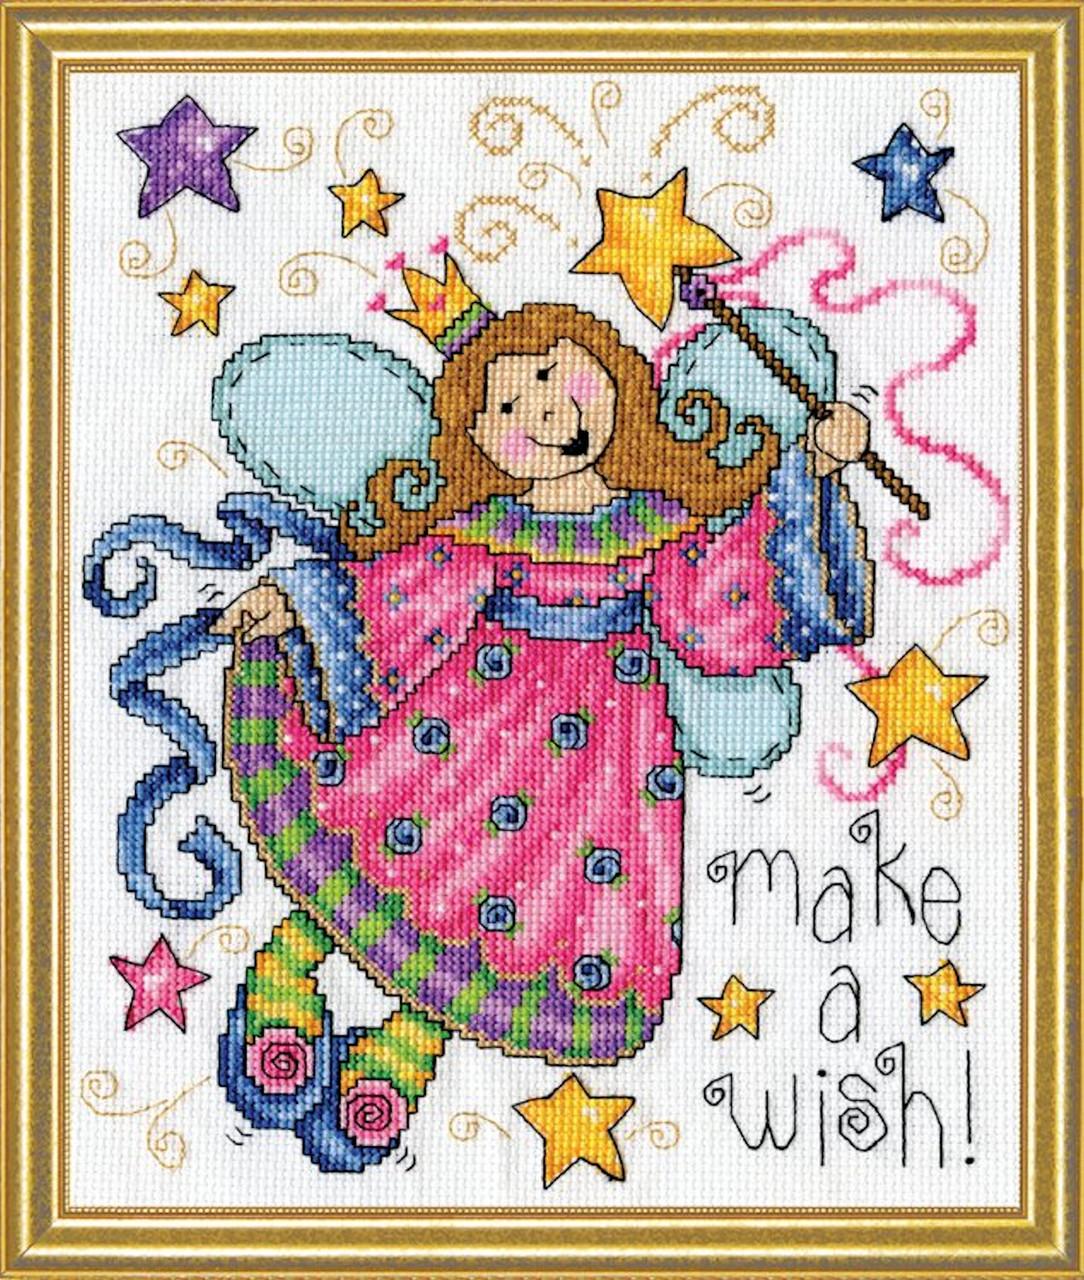 Design Works - Make a Wish